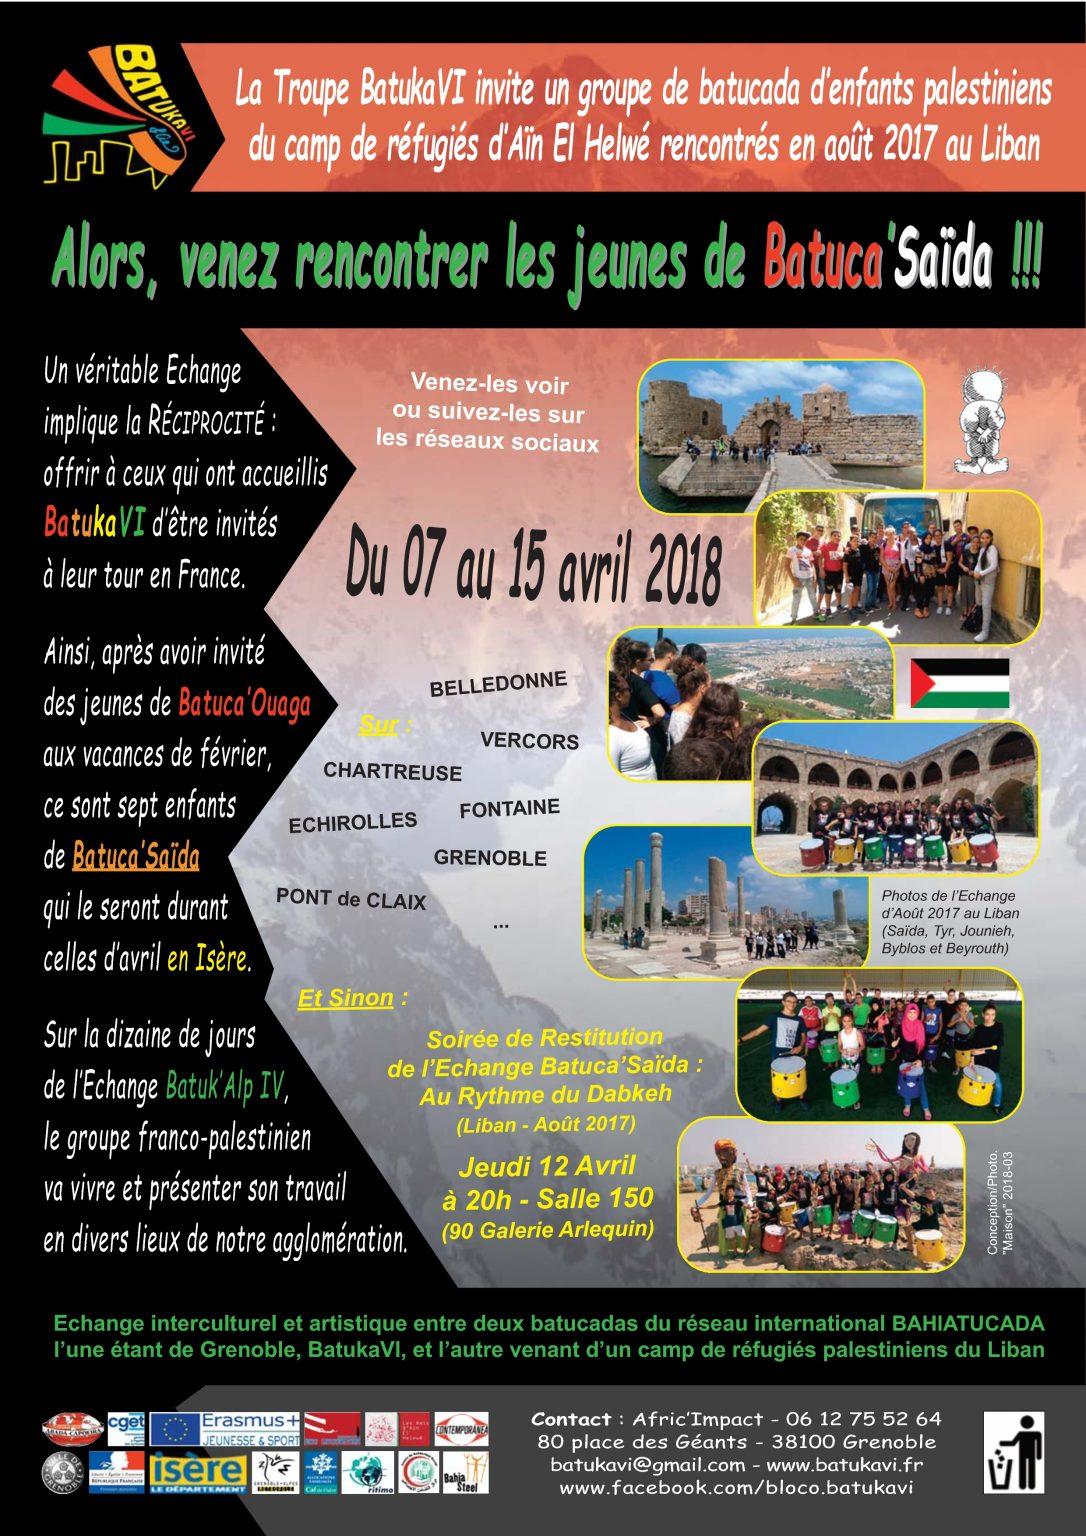 2018-04 Echange Batuk'Alp IV - Les Palestiniens